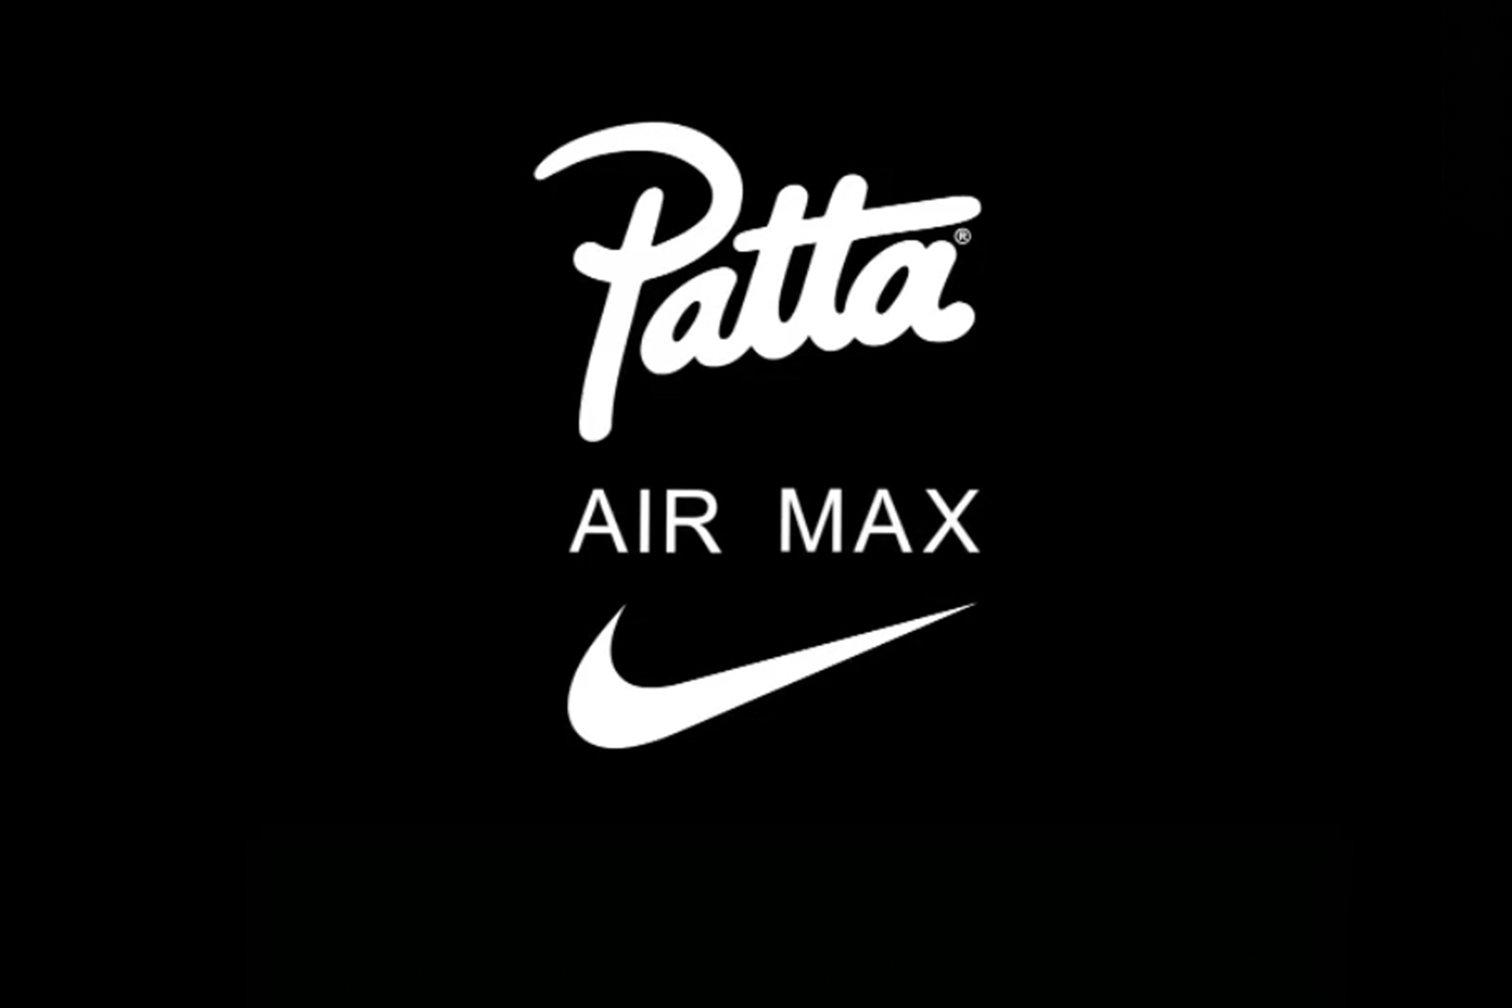 DH1348-001,Air Max 1,Nike,Patt  SNKRS 随时可能突袭!Patta x Nike 新联名预告释出!